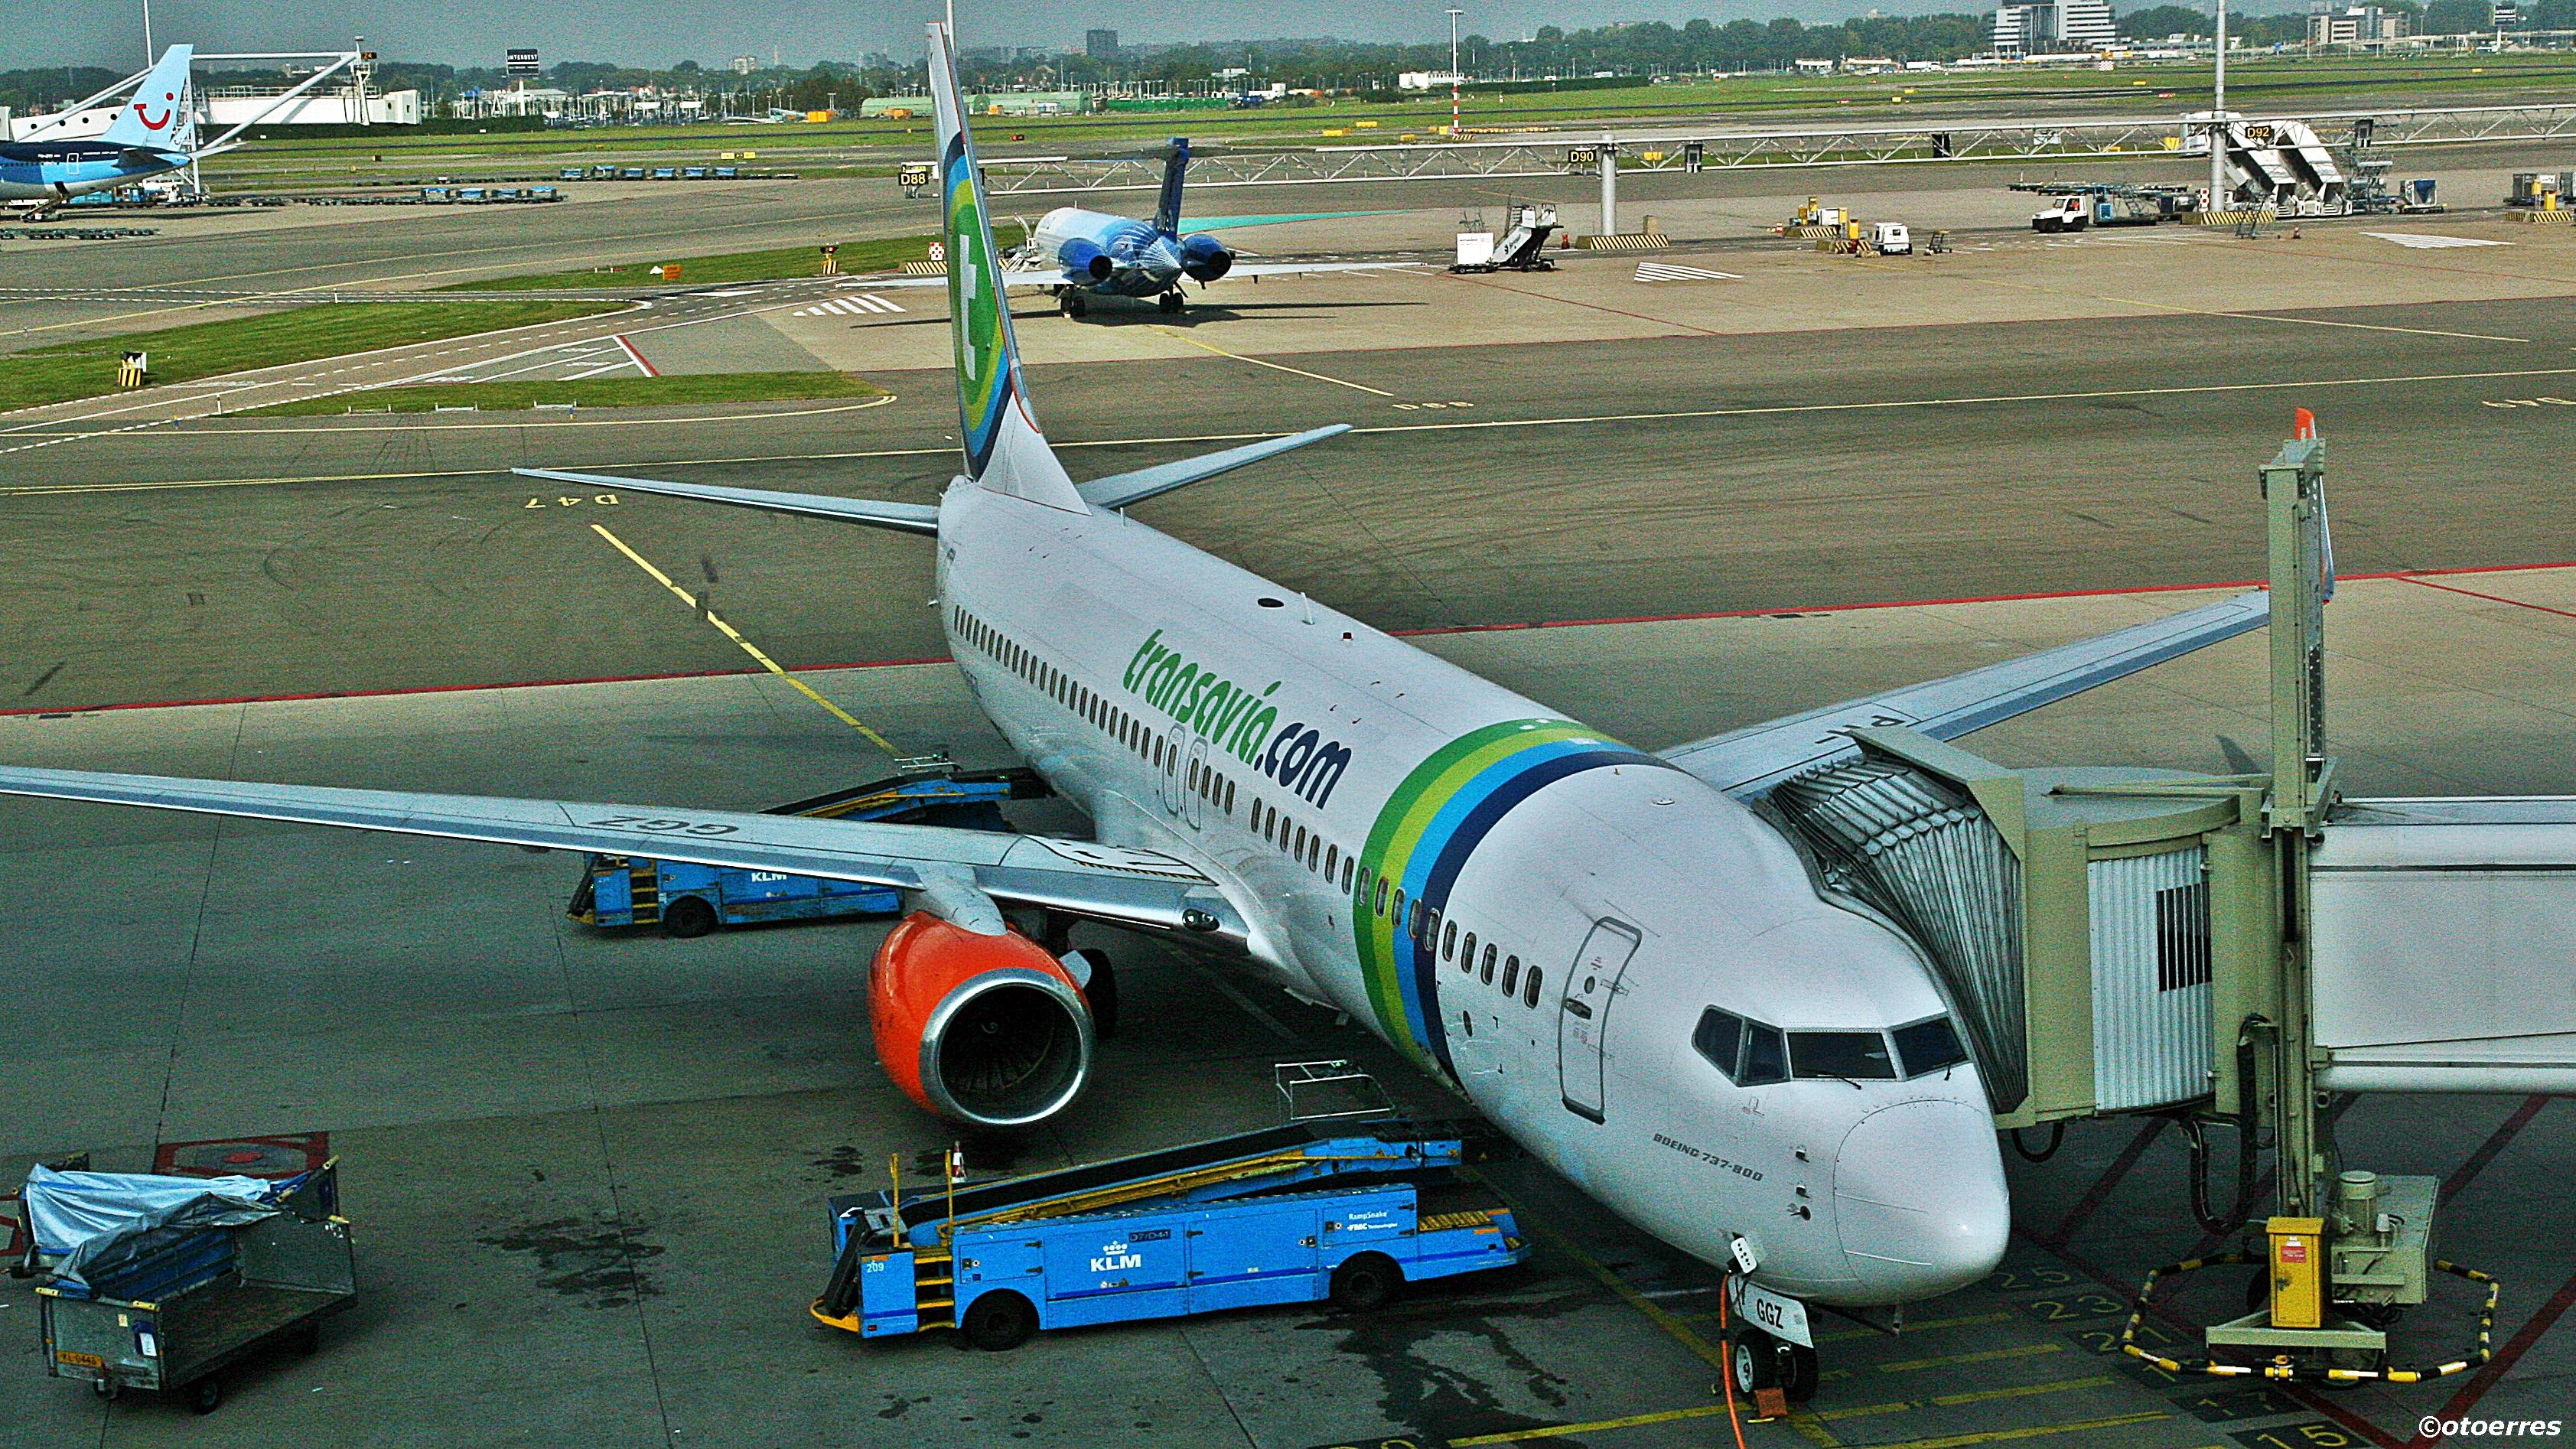 Transavia - Boeing 737 - Schiphol (foto: ©otoerres)